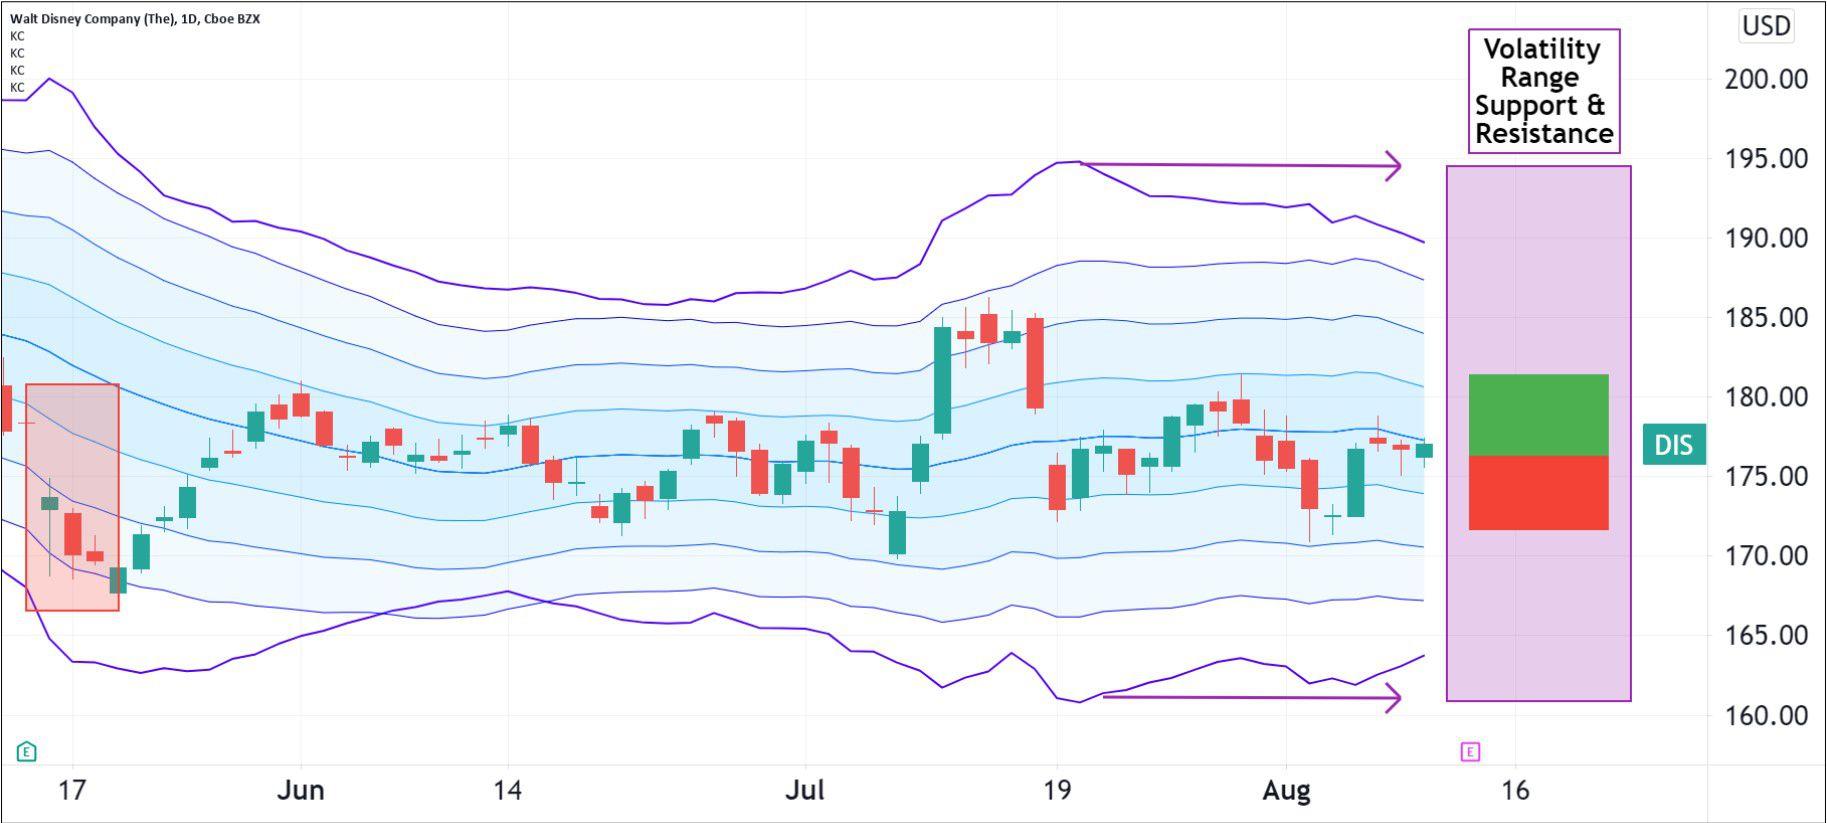 Volatility pattern for The Walt Disney Company (DIS)